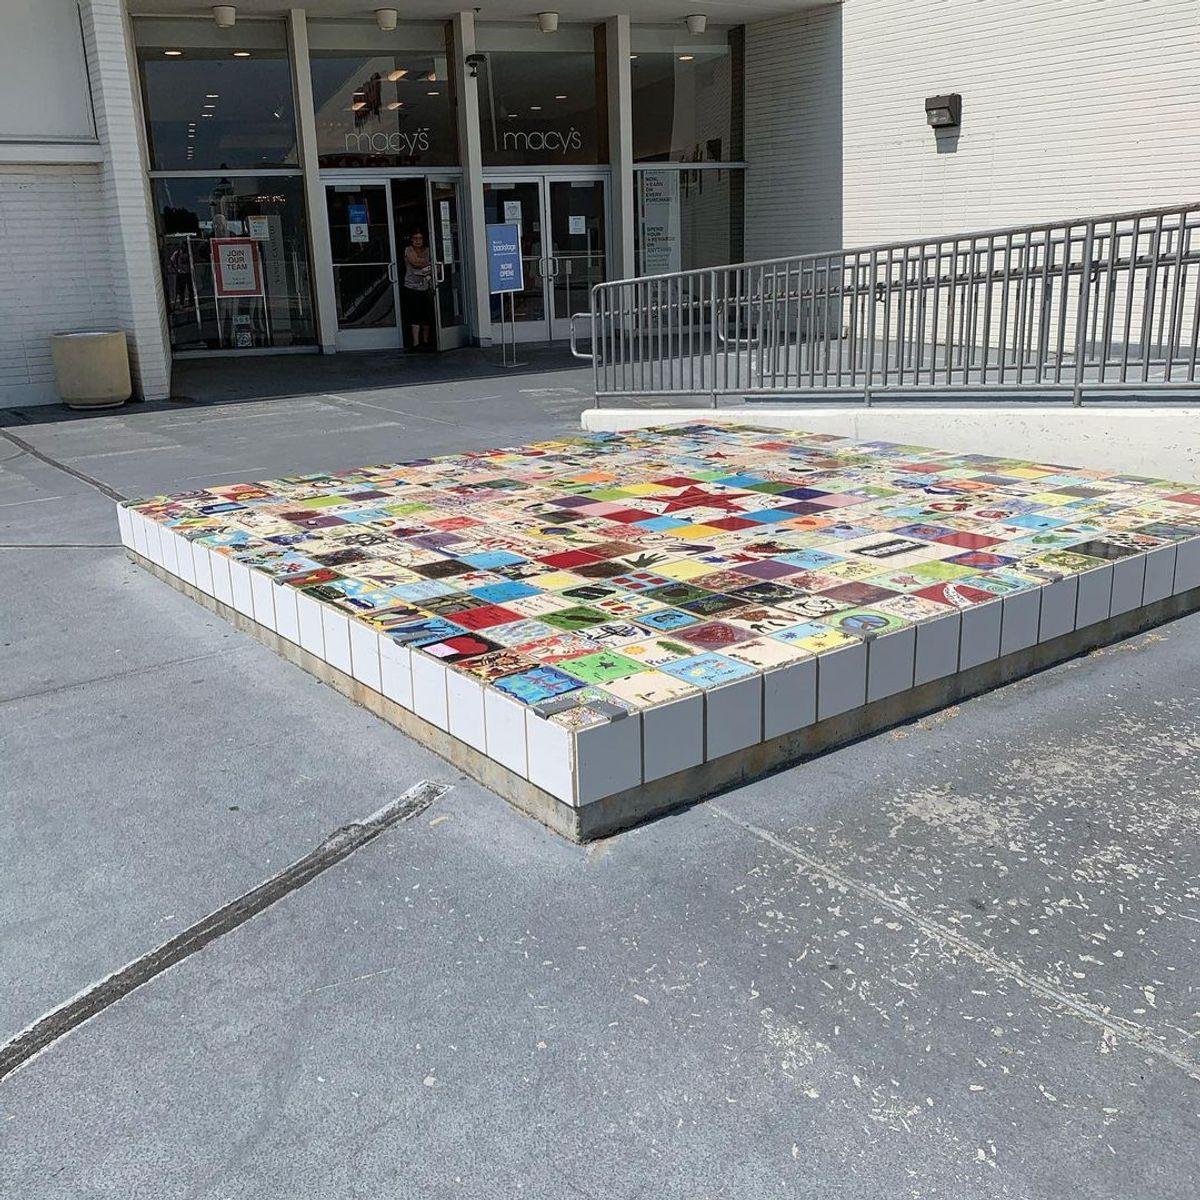 Image for skate spot Macy's Manny Pad